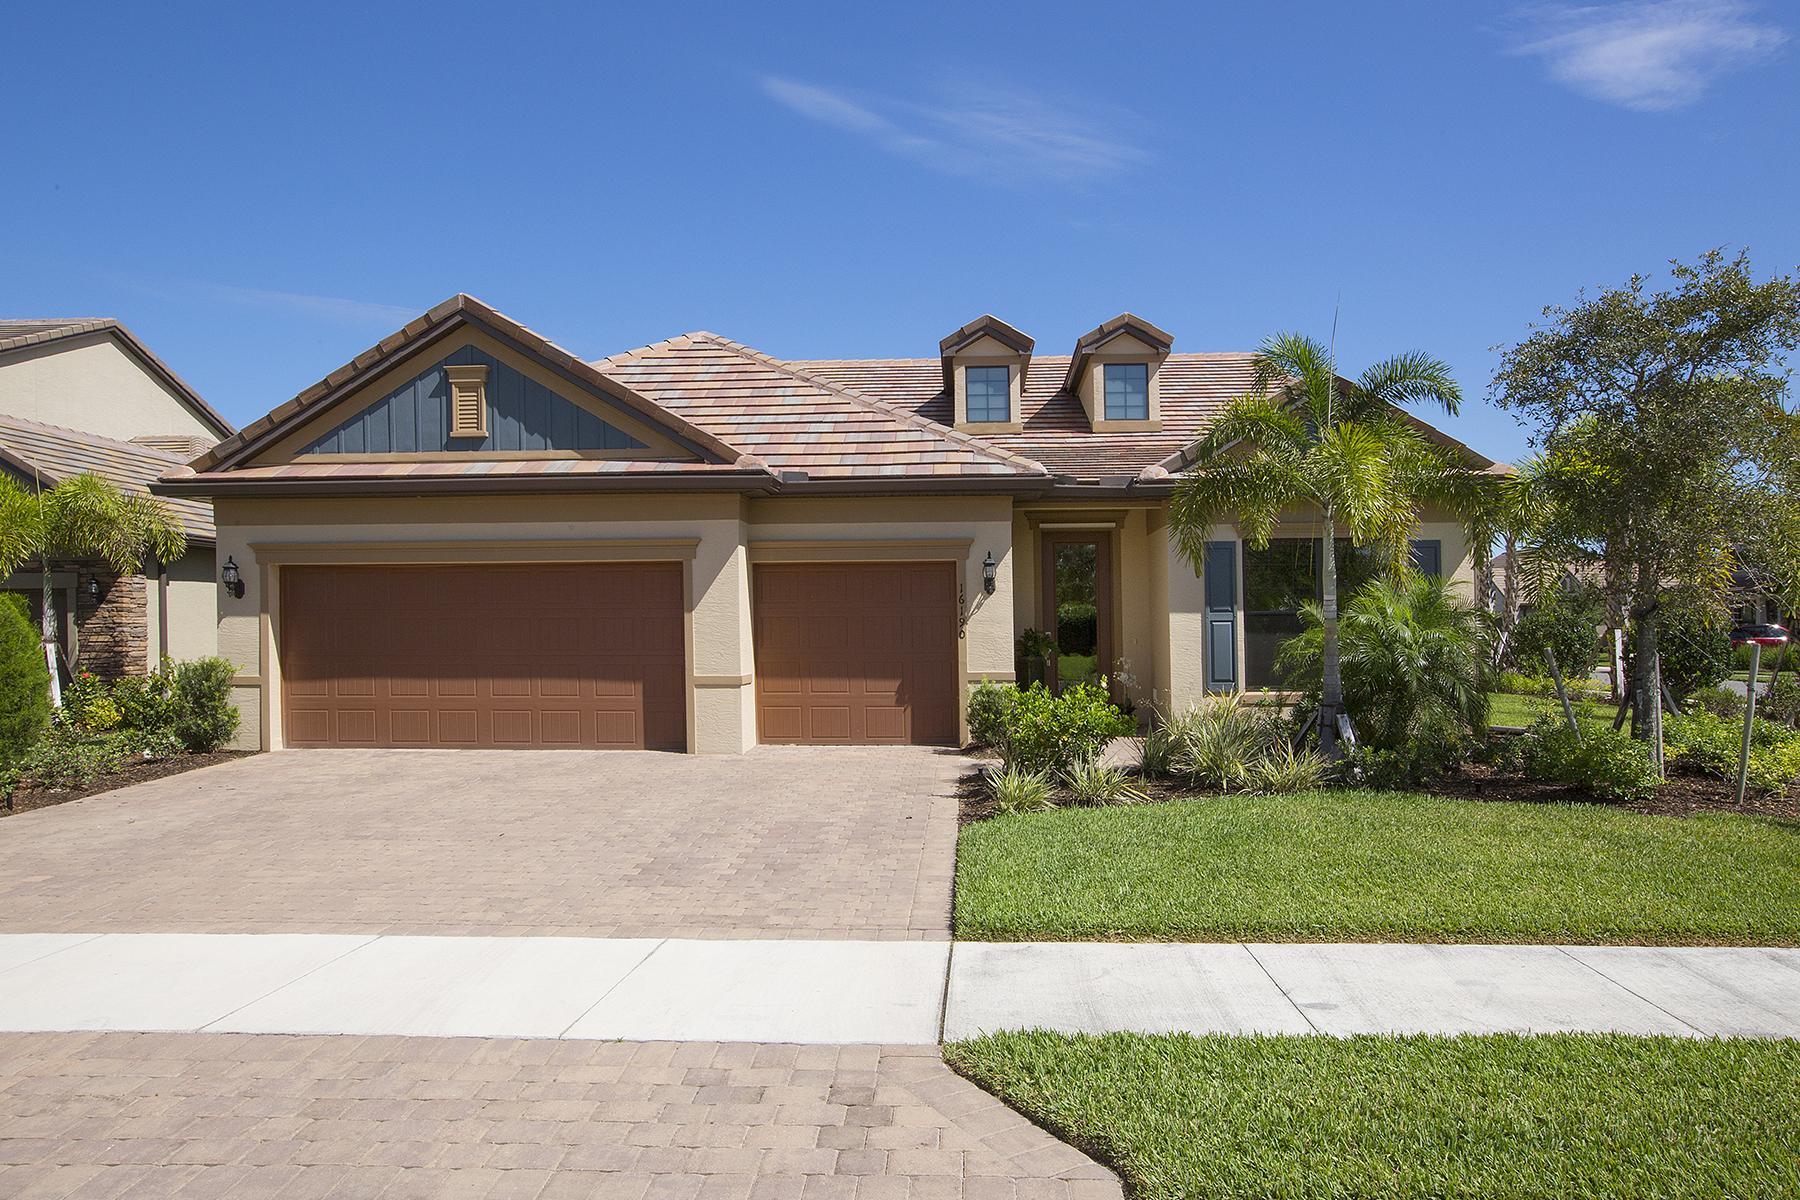 Single Family Home for Sale at CAMDEN LAKES 16190 Camden Lakes Cir, Naples, Florida 34110 United States